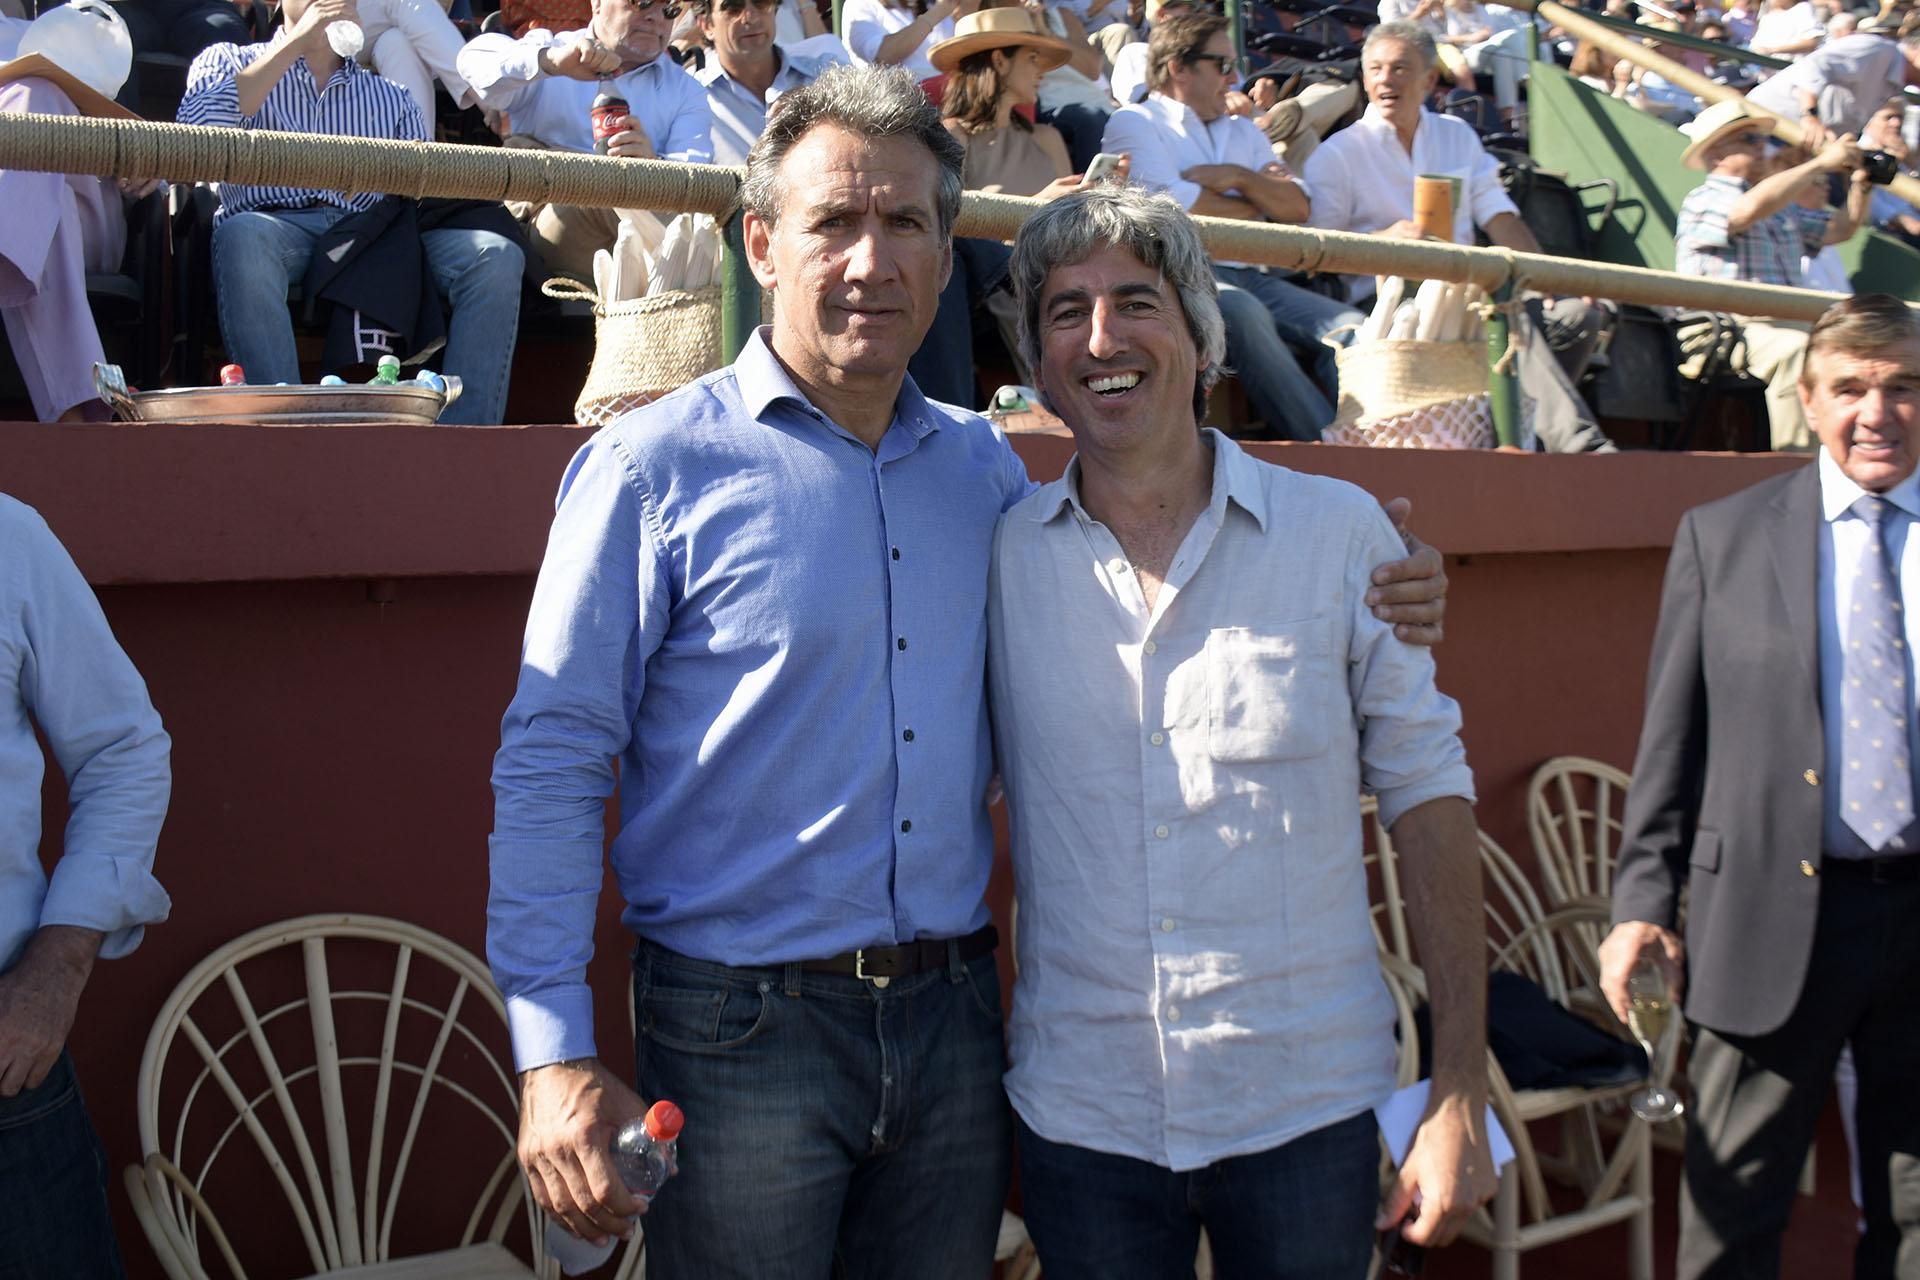 Rafael Cúneo Libarona y Delfín Uranga, vicepresidente de la Asociación Argentina de Polo